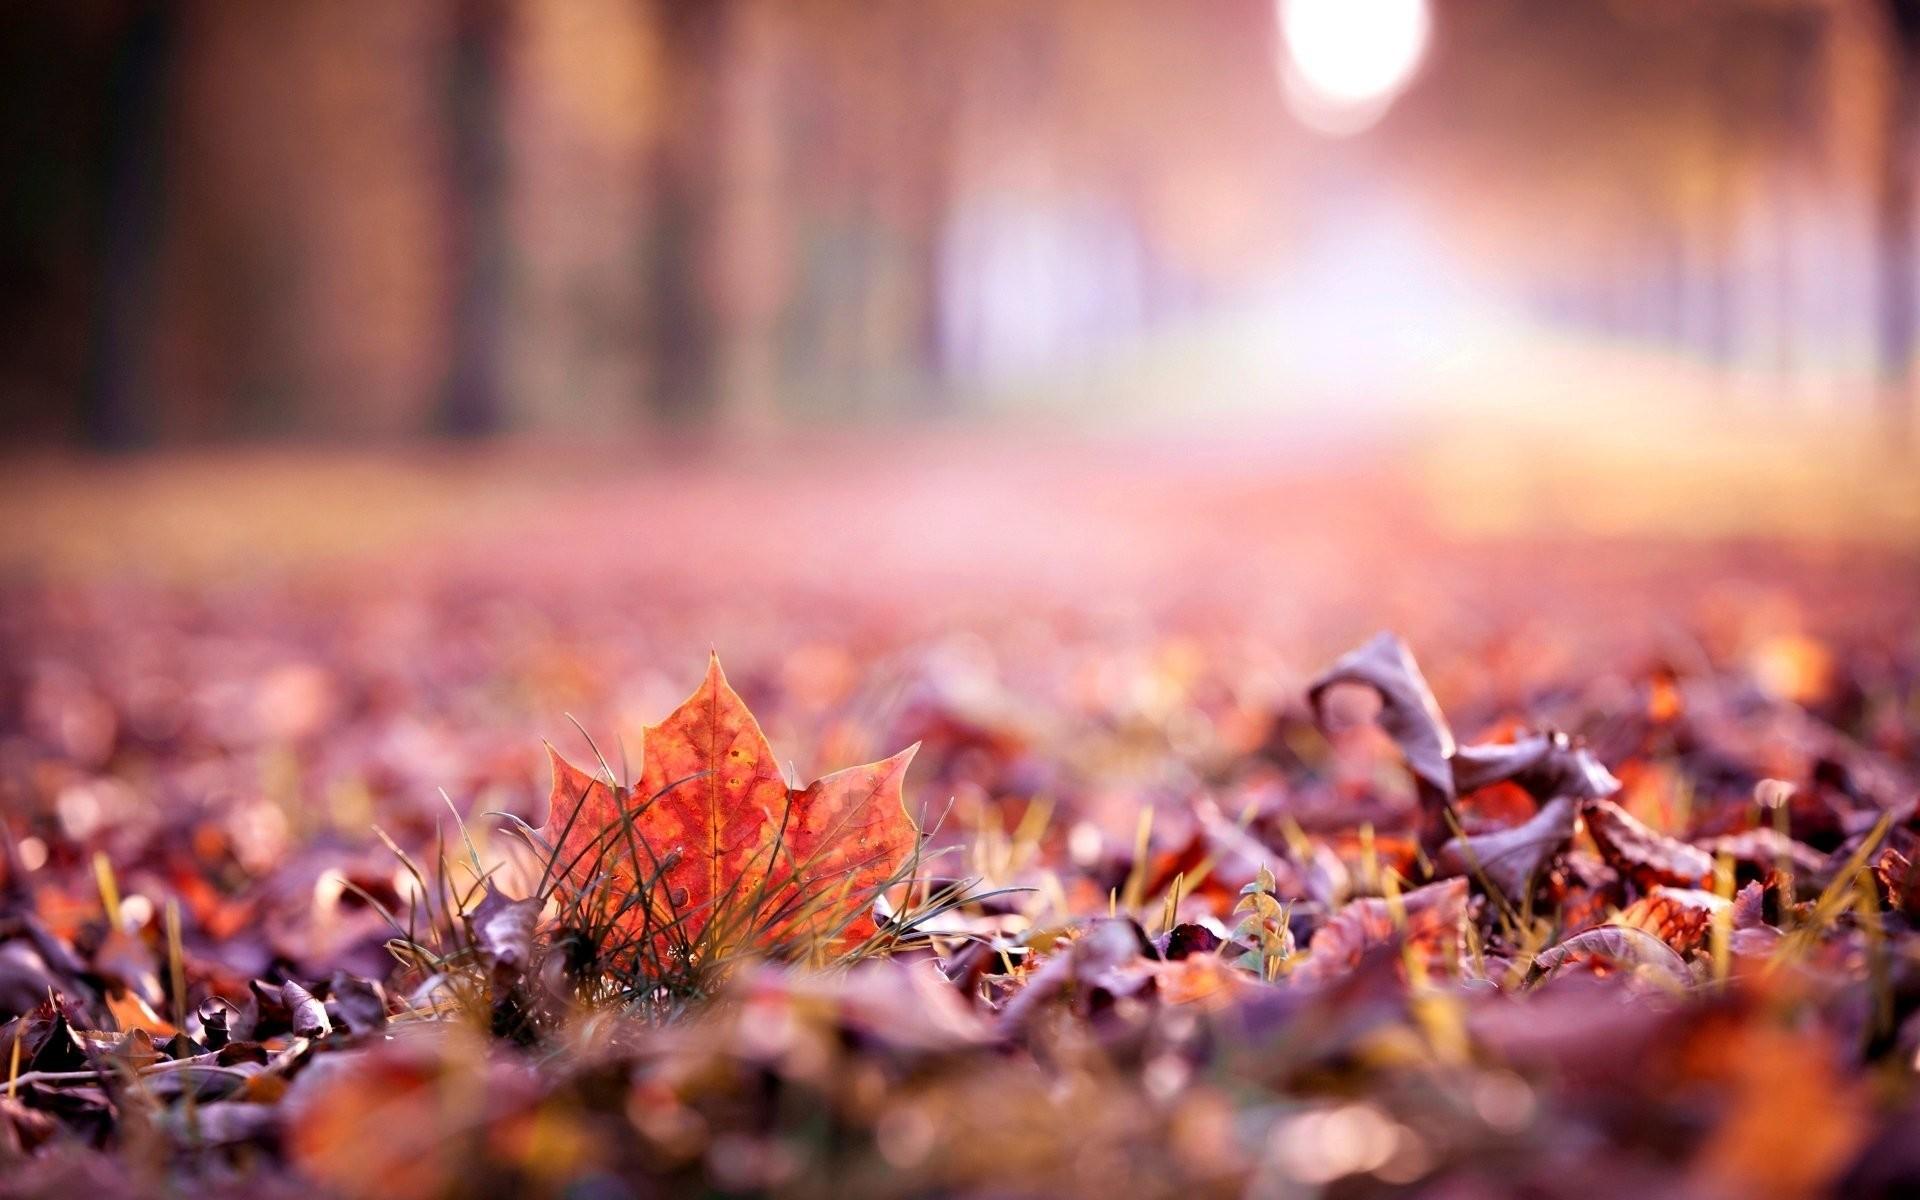 close up autumn leaves leaf leaf autumn autumn leave leaves macro blur  beautiful wallpaper widescreen full